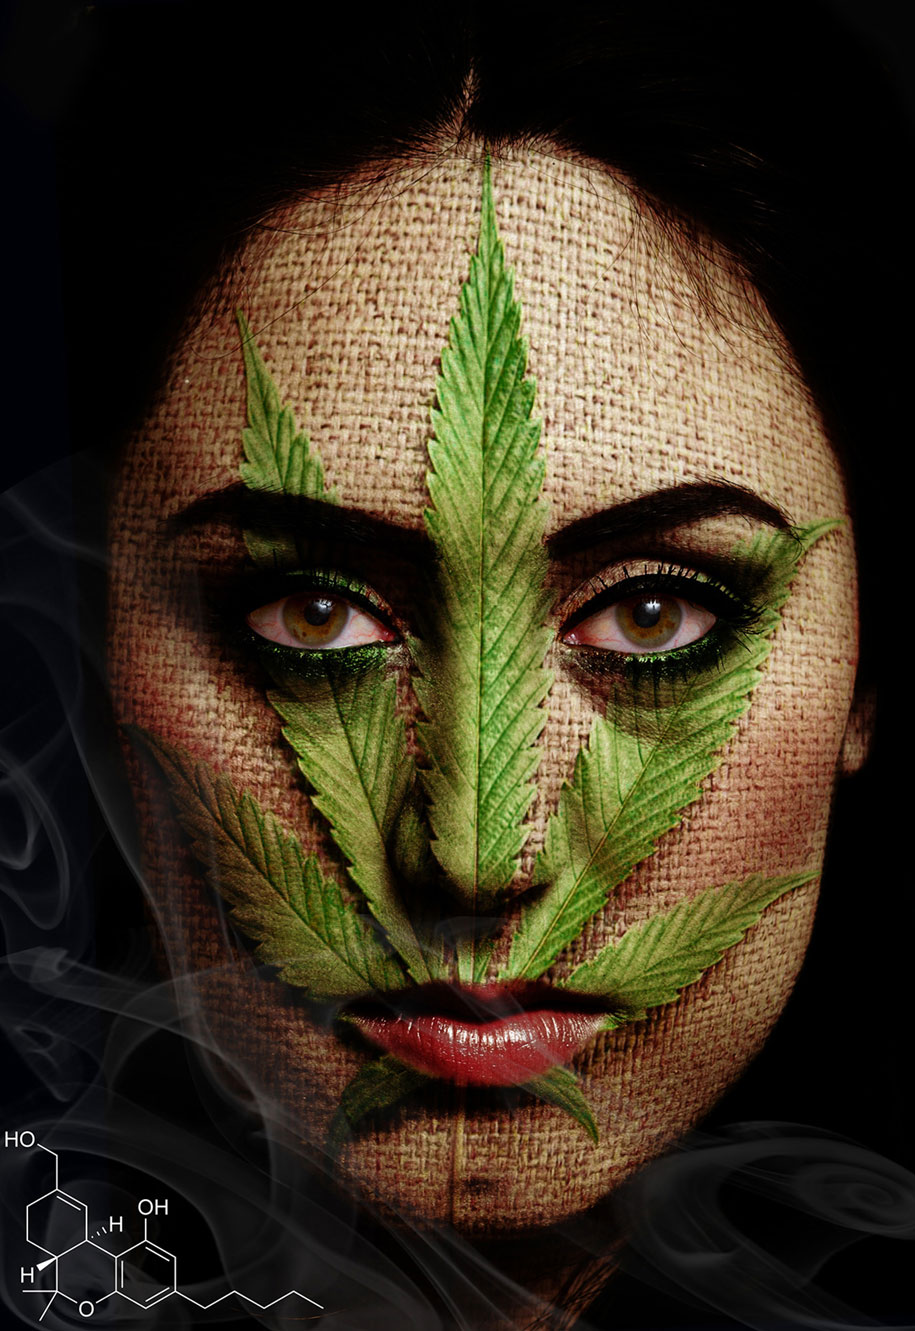 people-using-drugs-portraits-inebrination-les-baker-v-2